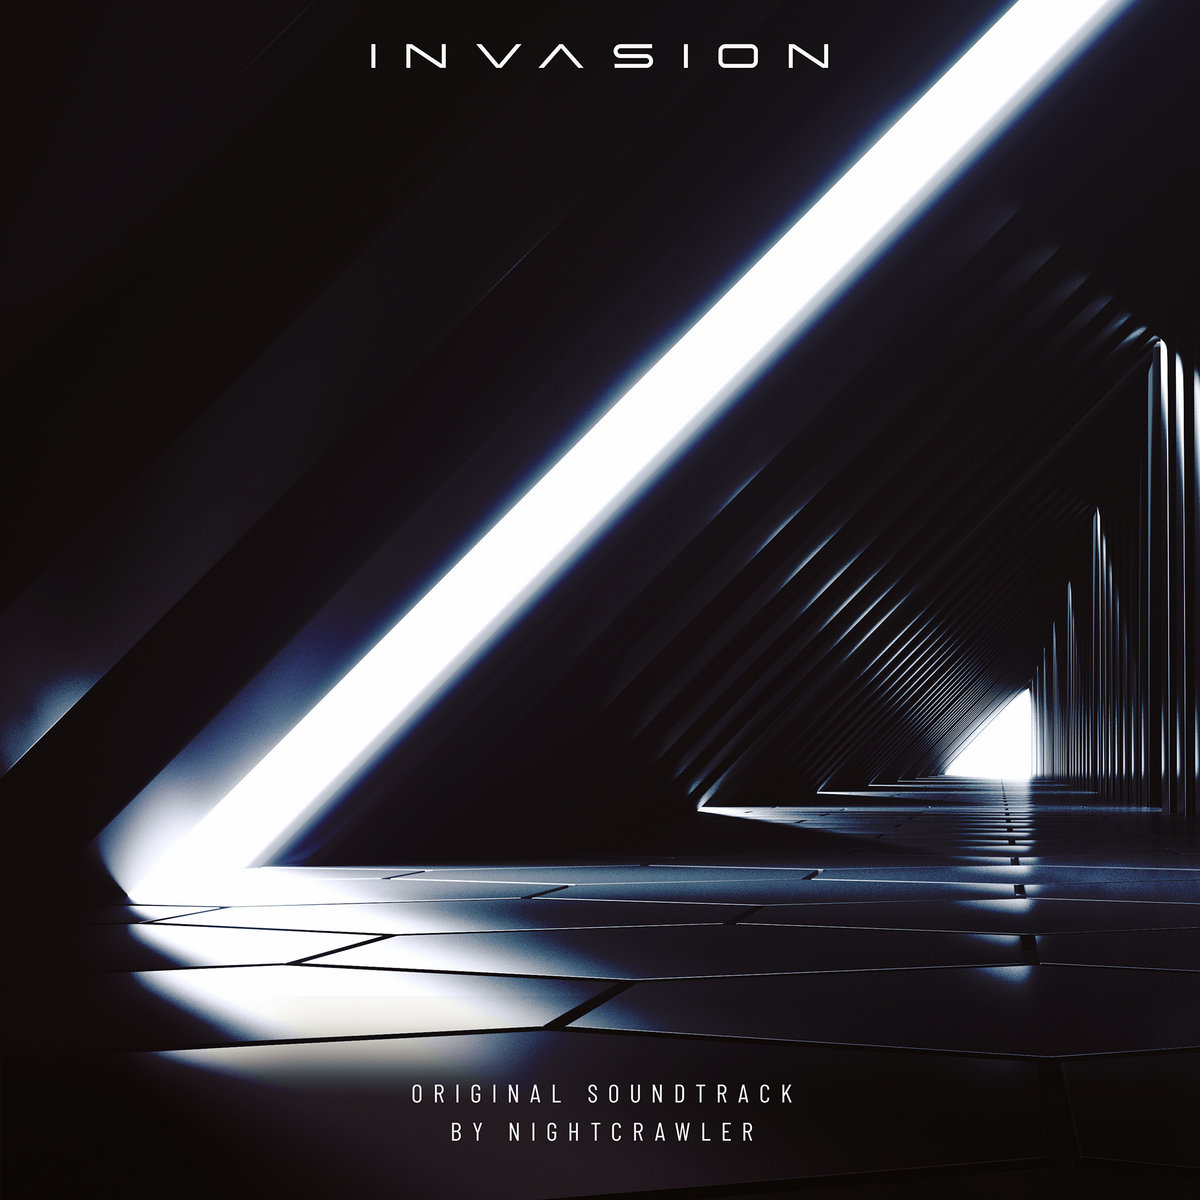 Invasion (Original Soundtrack) | Nightcrawler